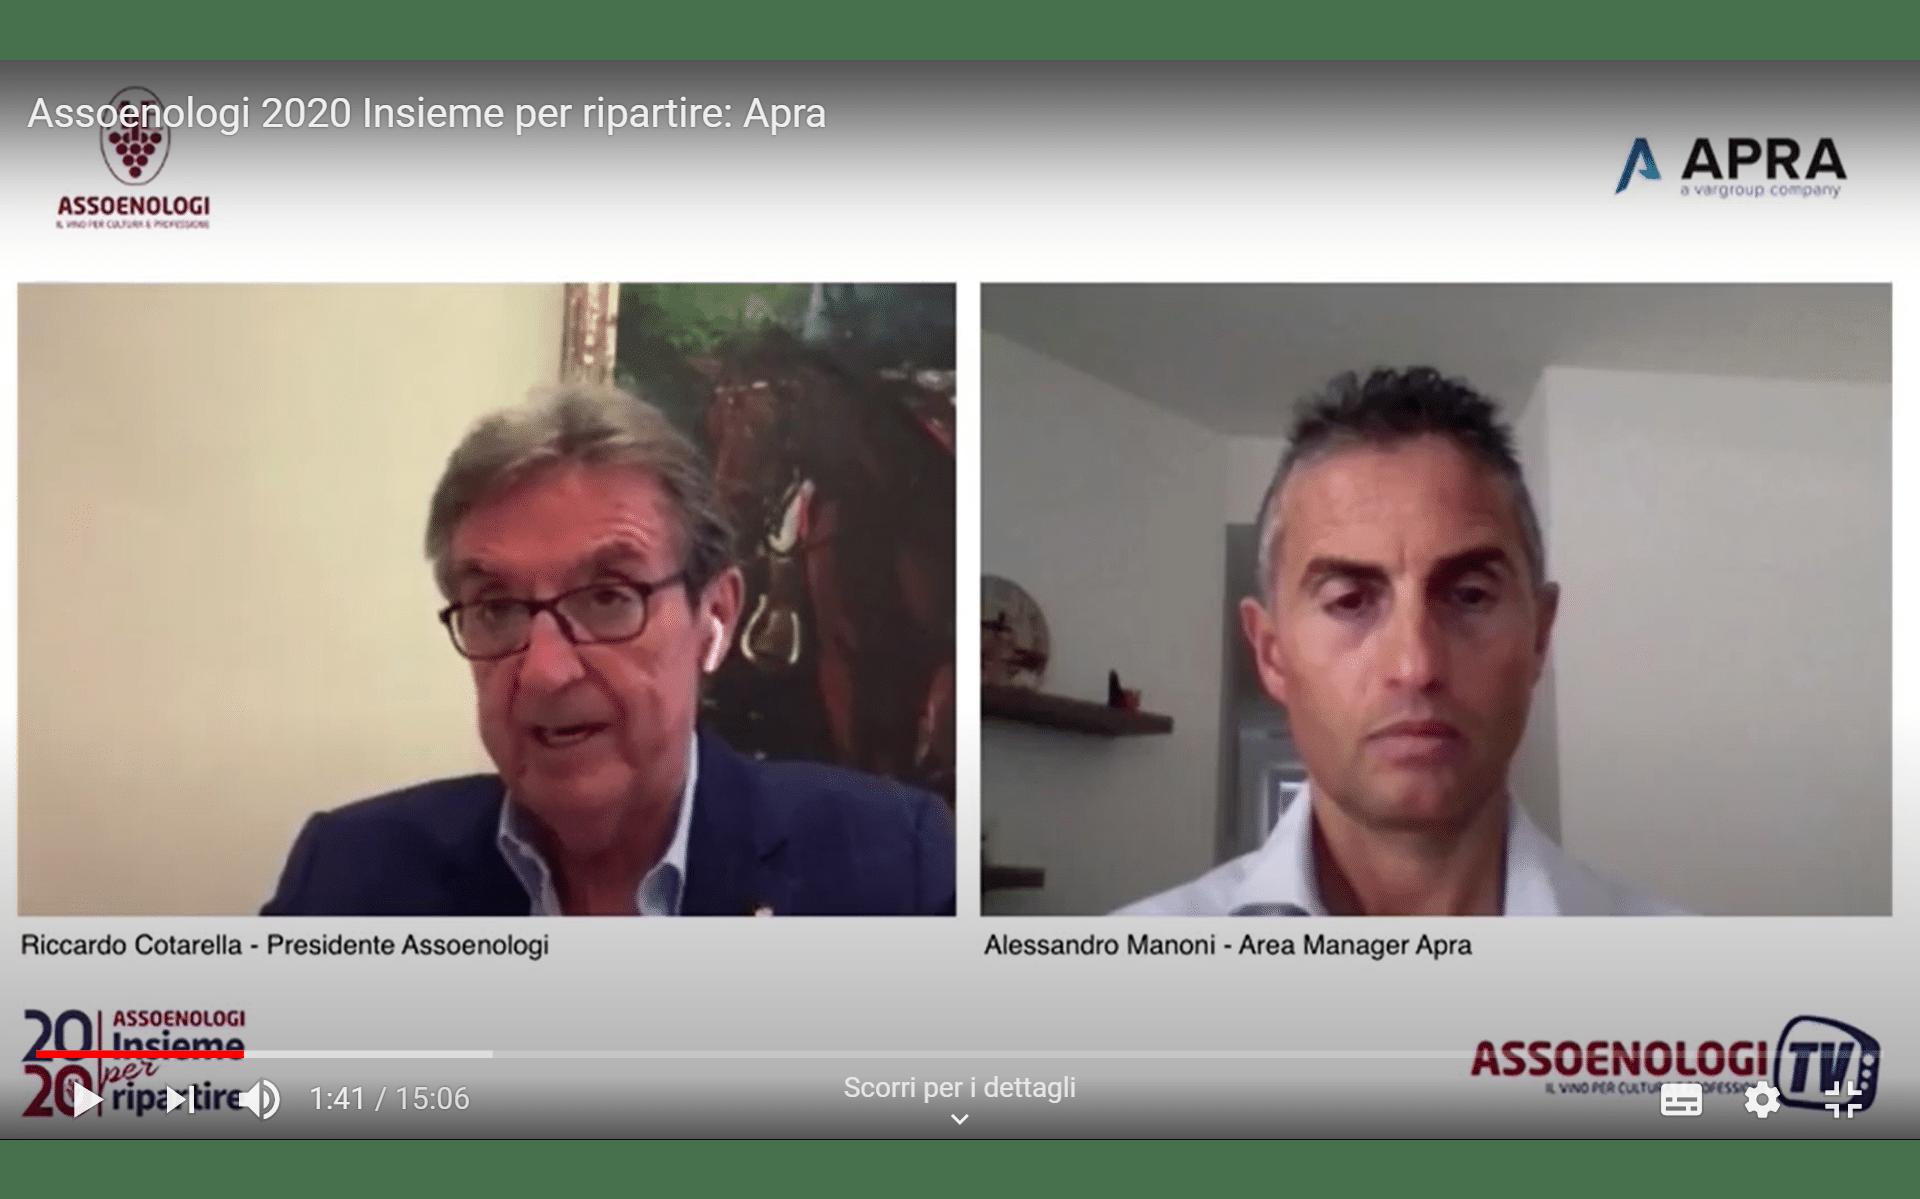 Apra ad Assoenologi 2020: guarda l'intervista